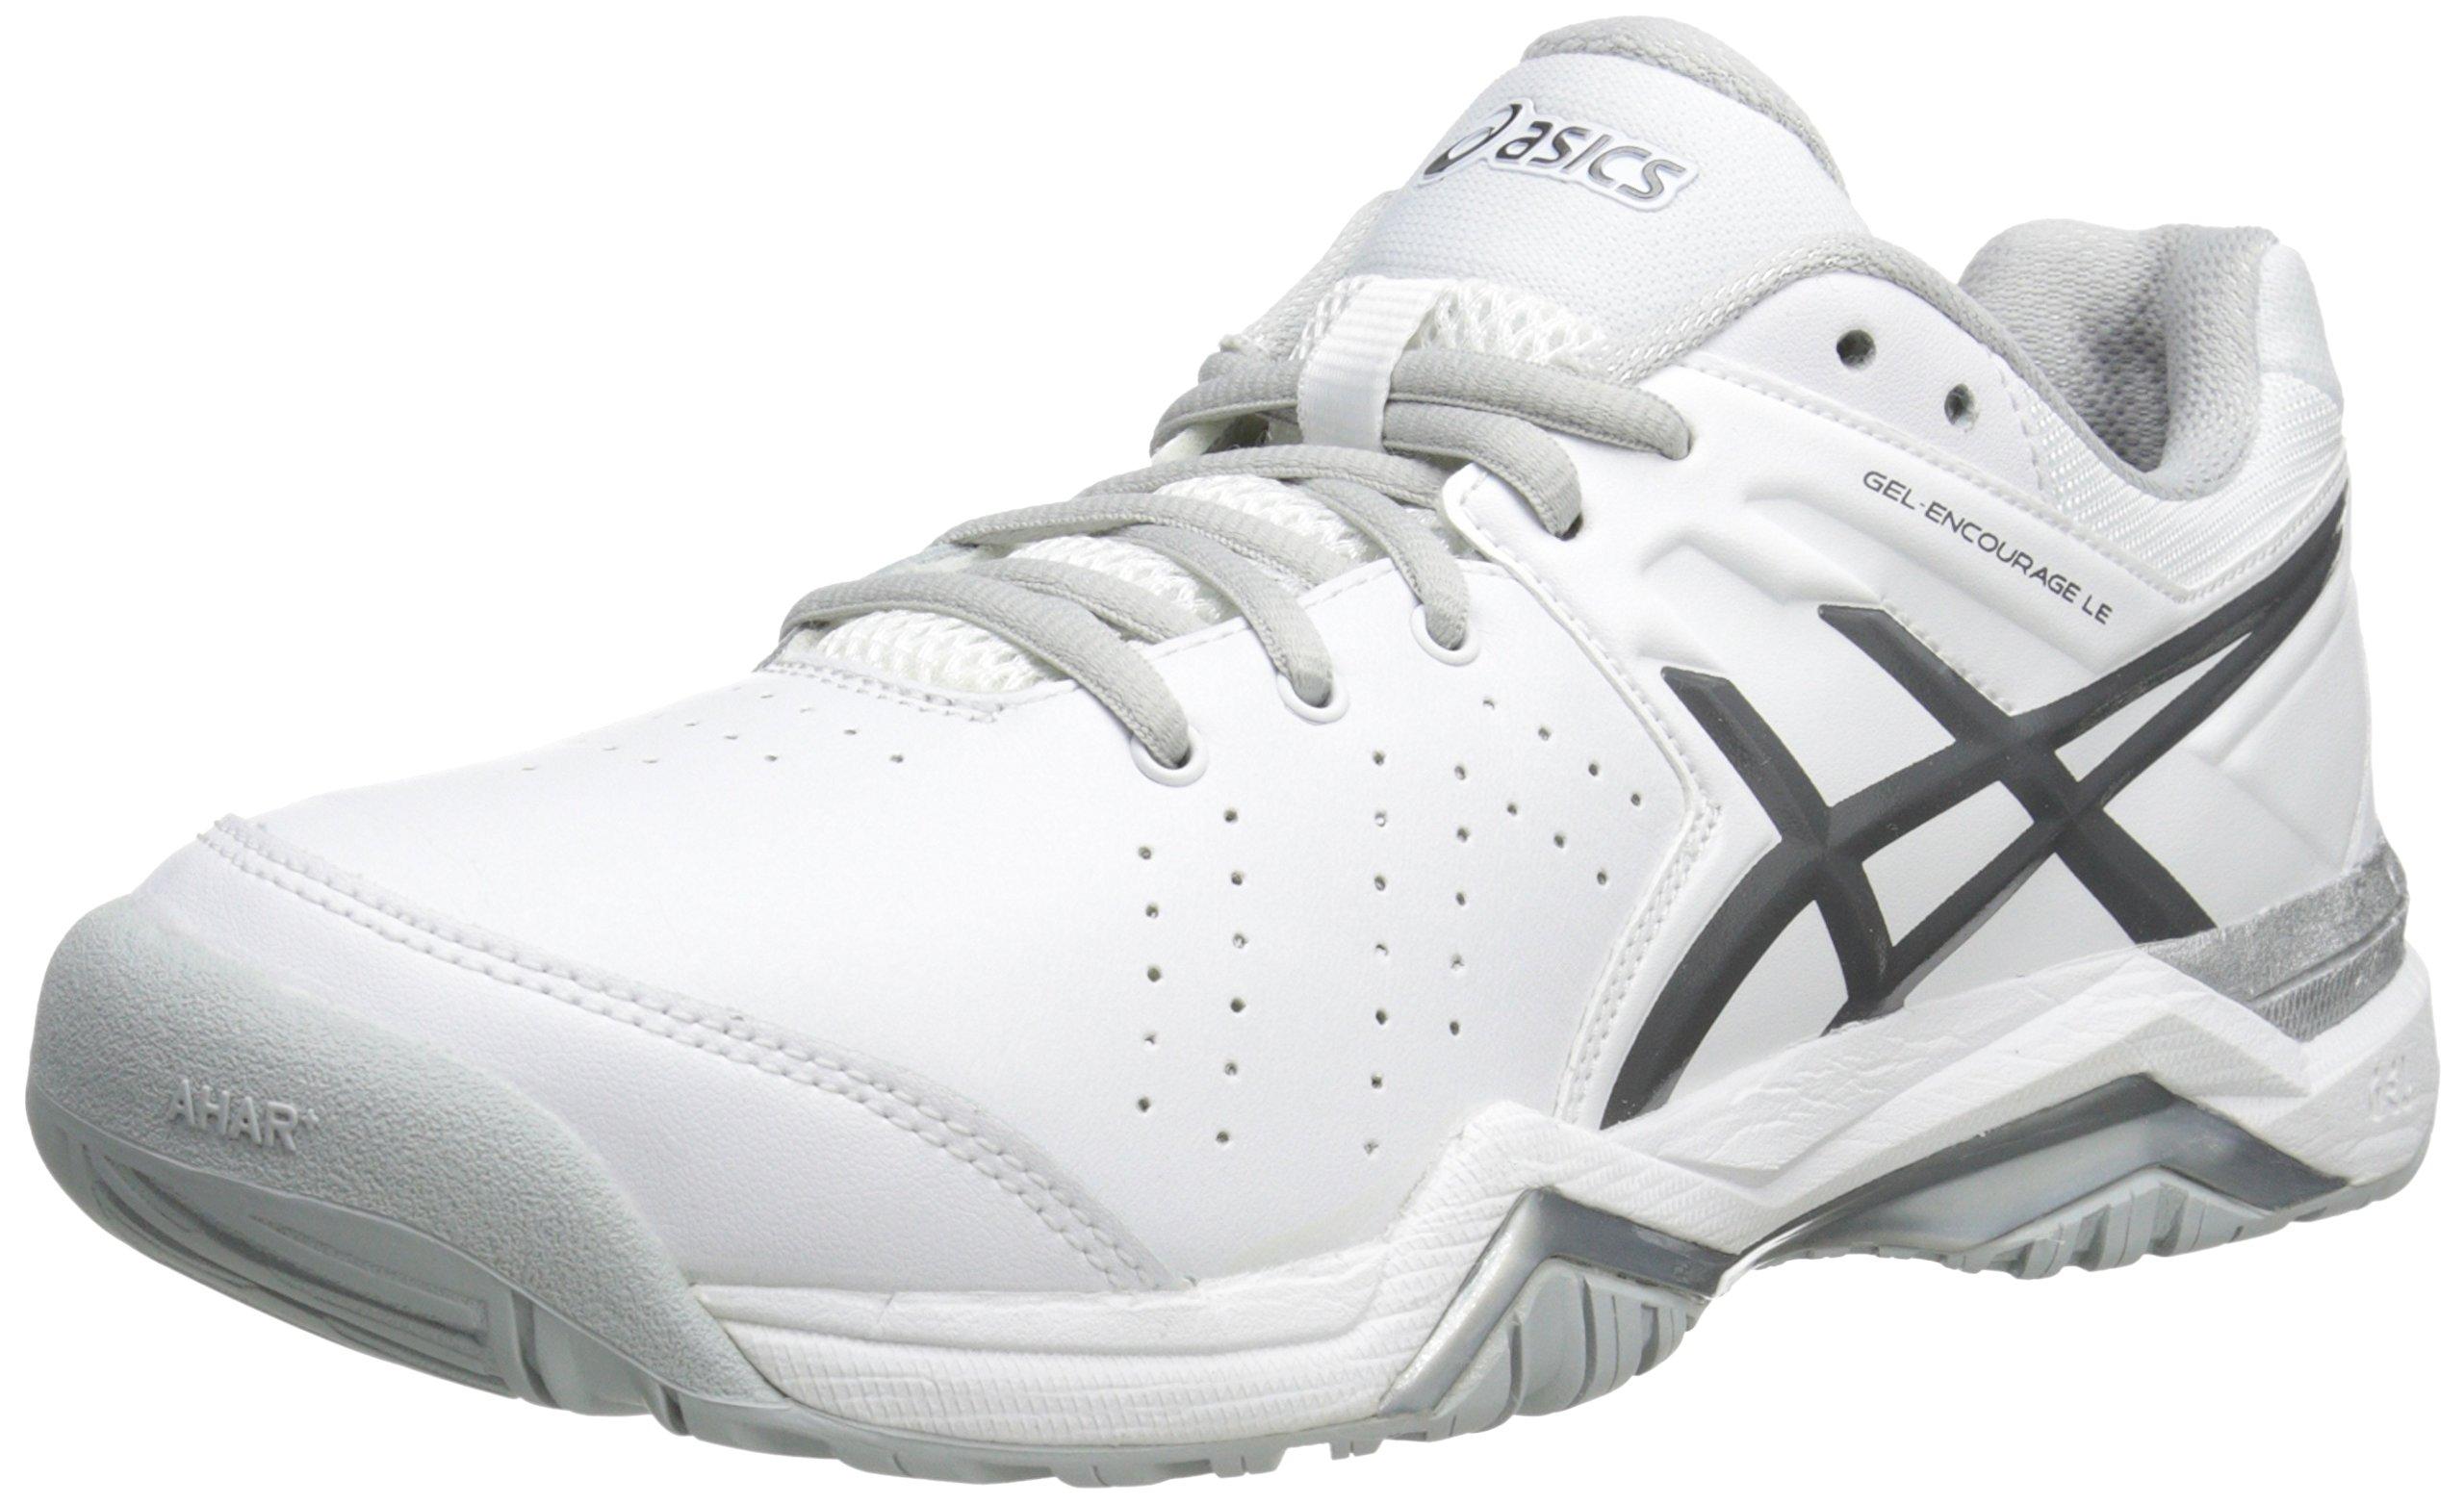 ASICS Women's Gel-Encourage Le Tennis Shoe,White/Silver,9 M US